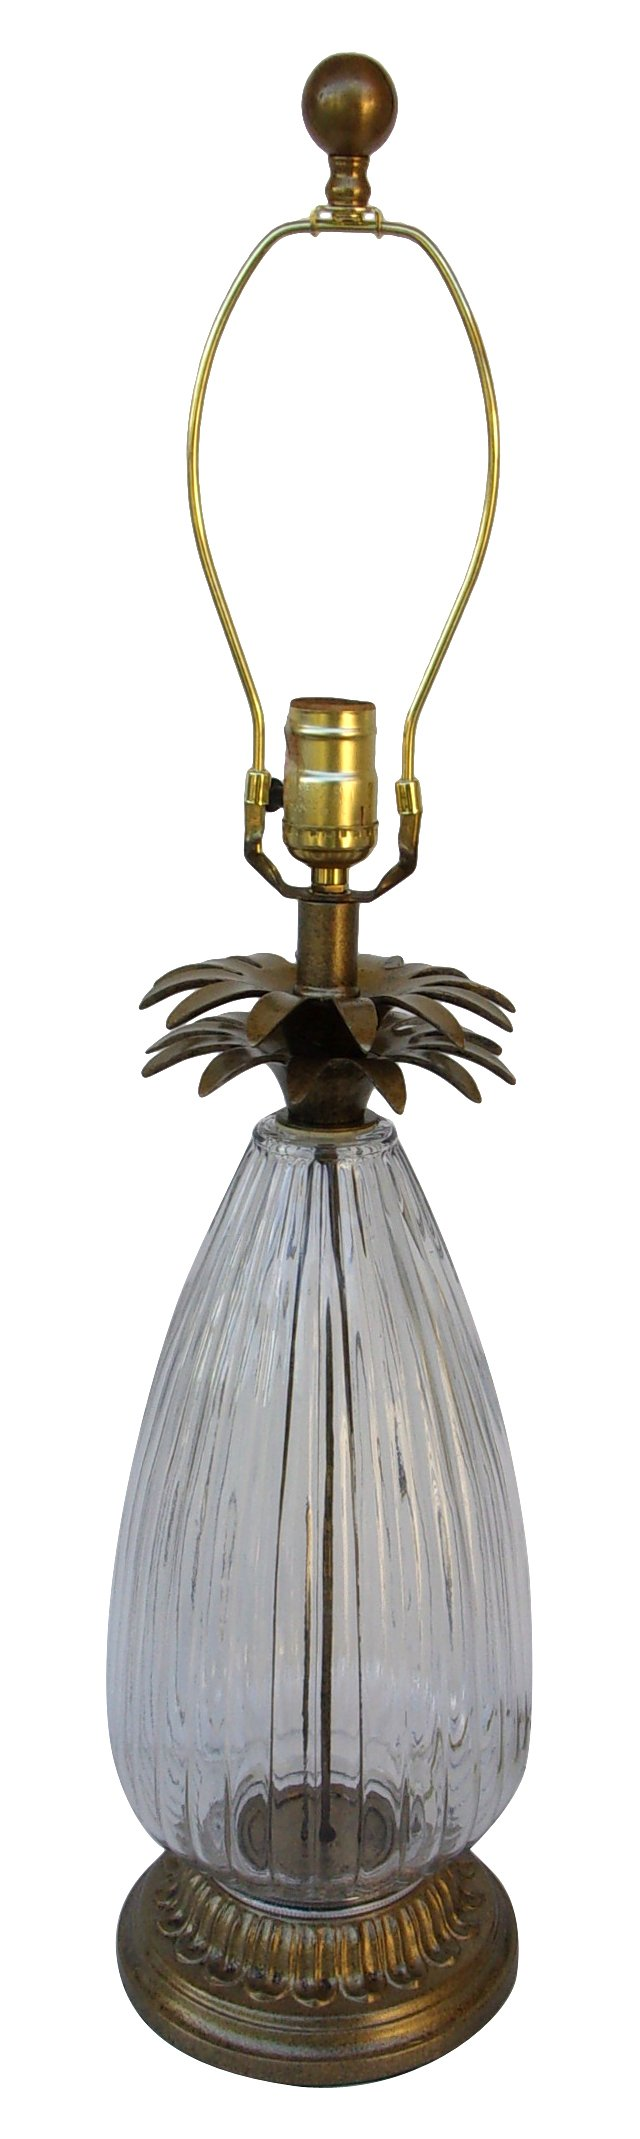 Midcentury Glass Pineapple Lamp